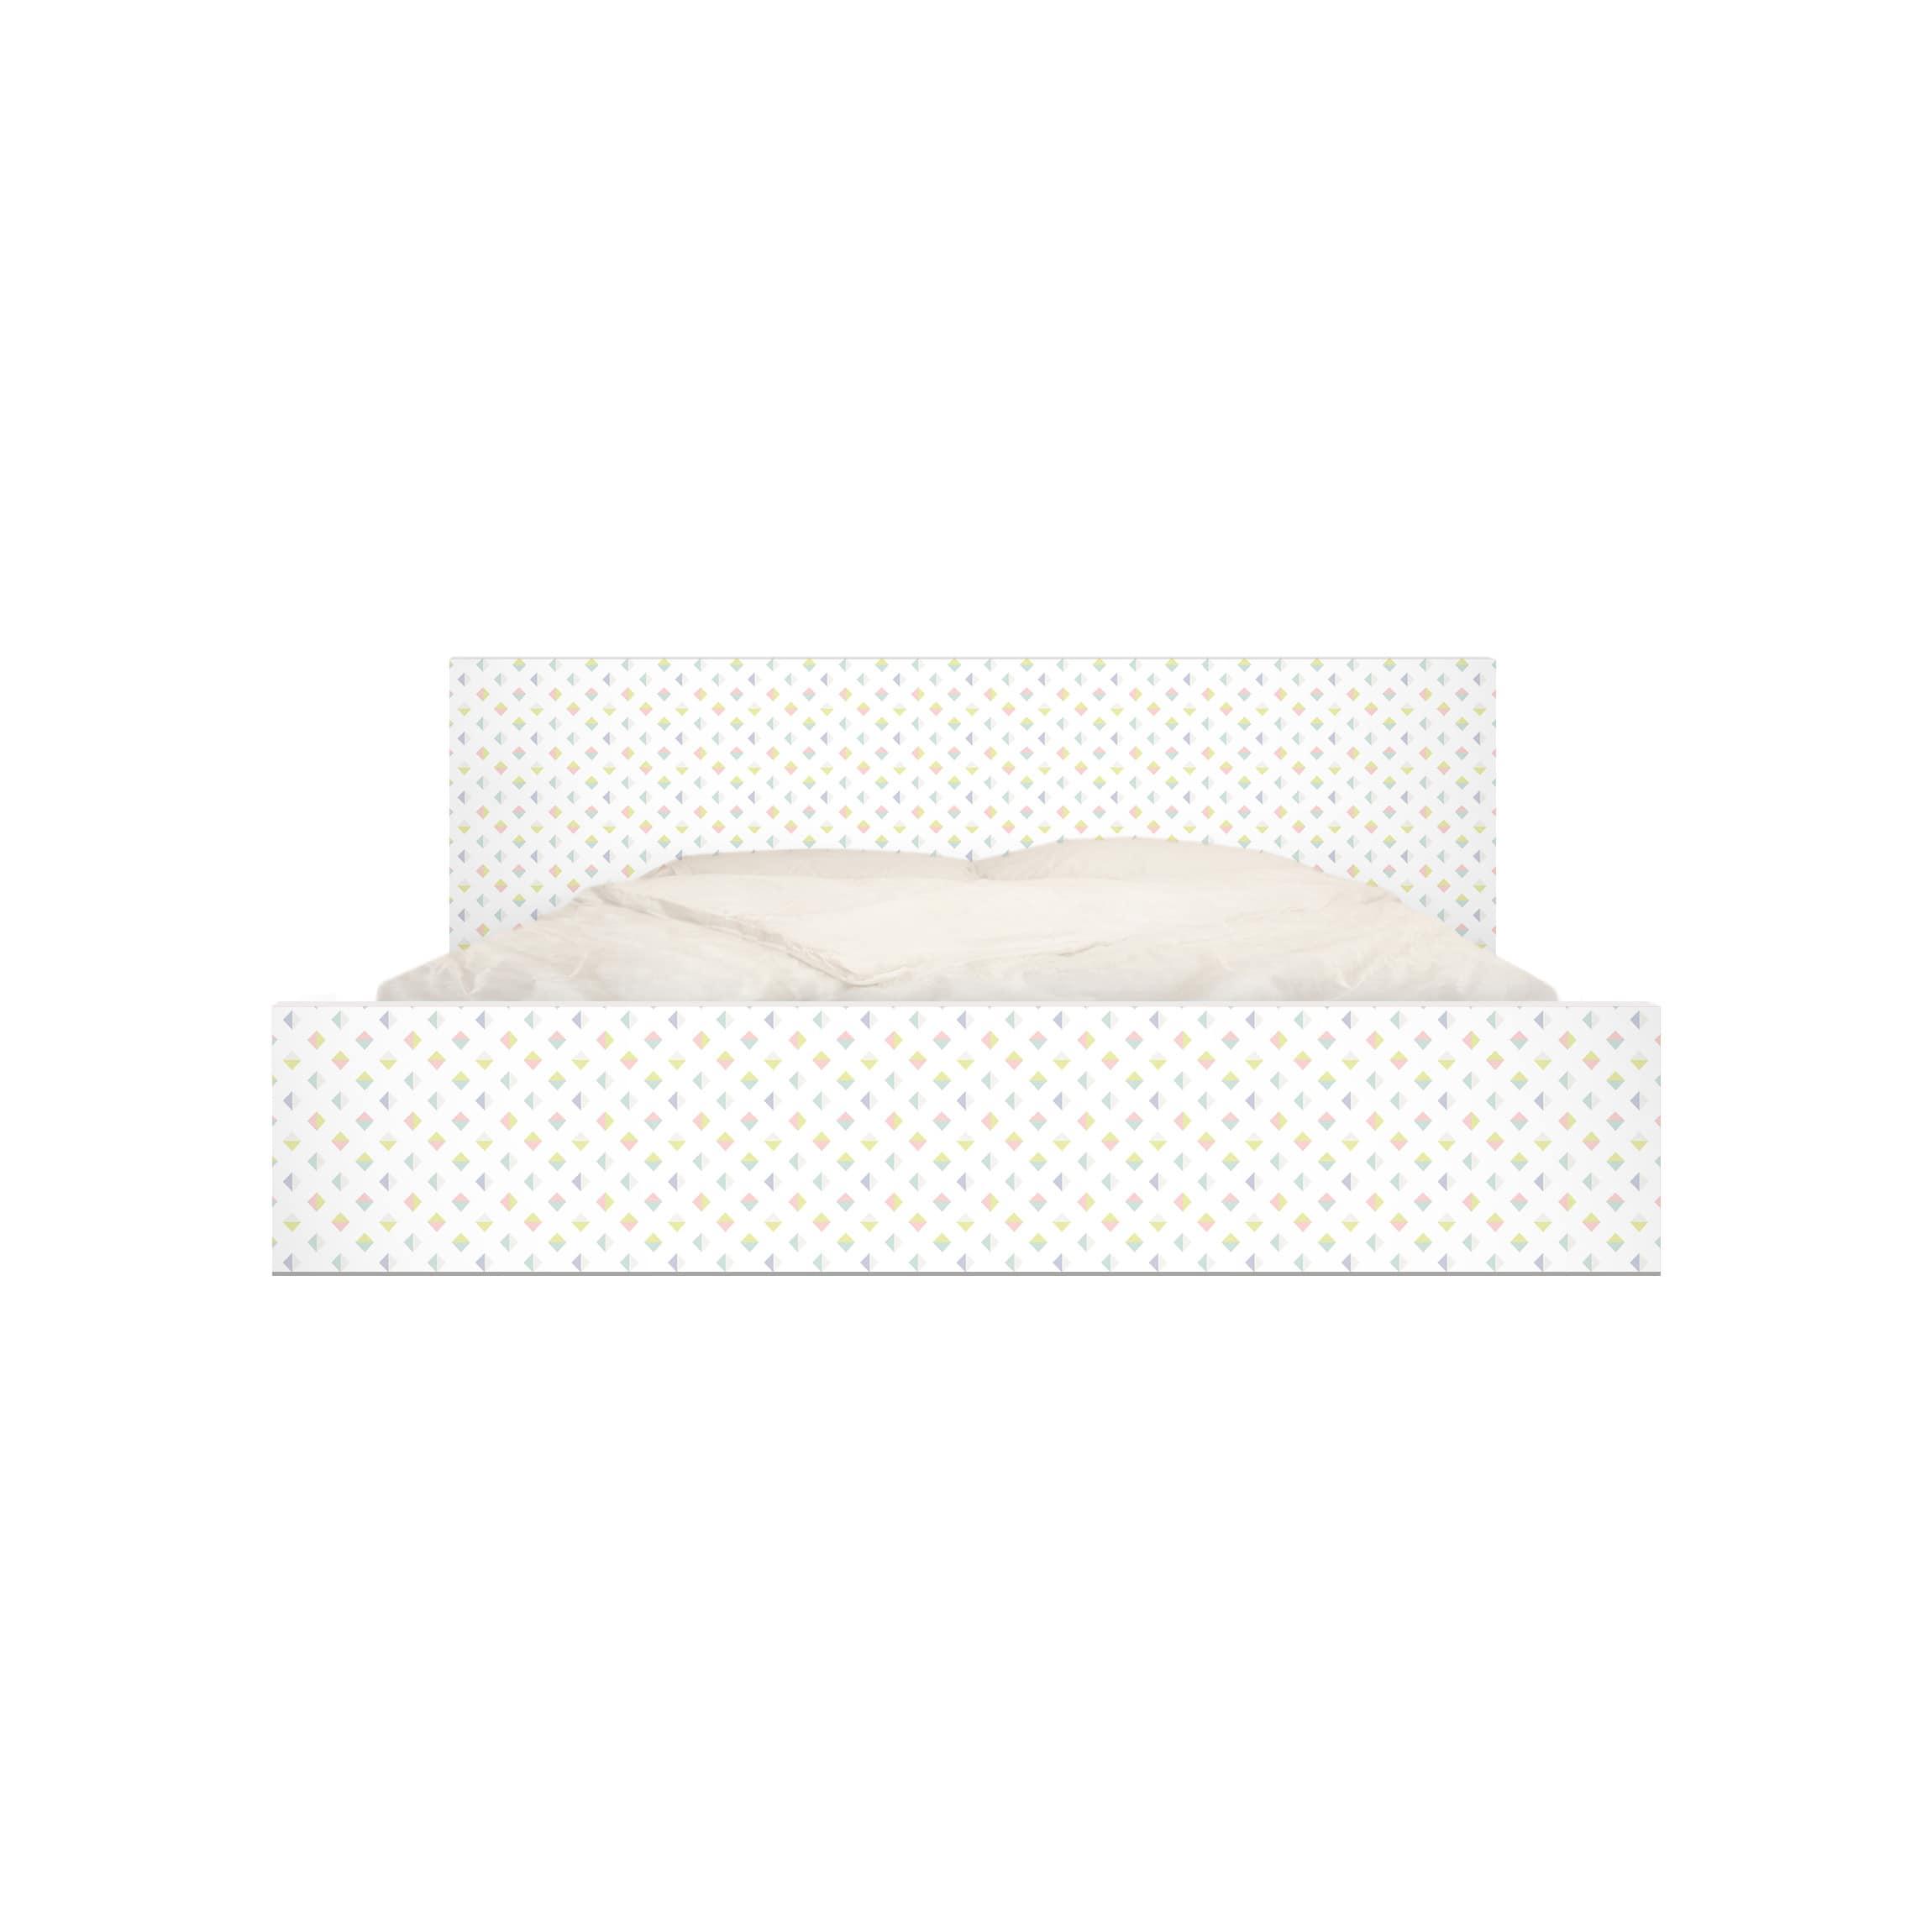 Mobelfolie Fur Ikea Malm Bett Niedrig 140x200cm Pastell Dreiecke